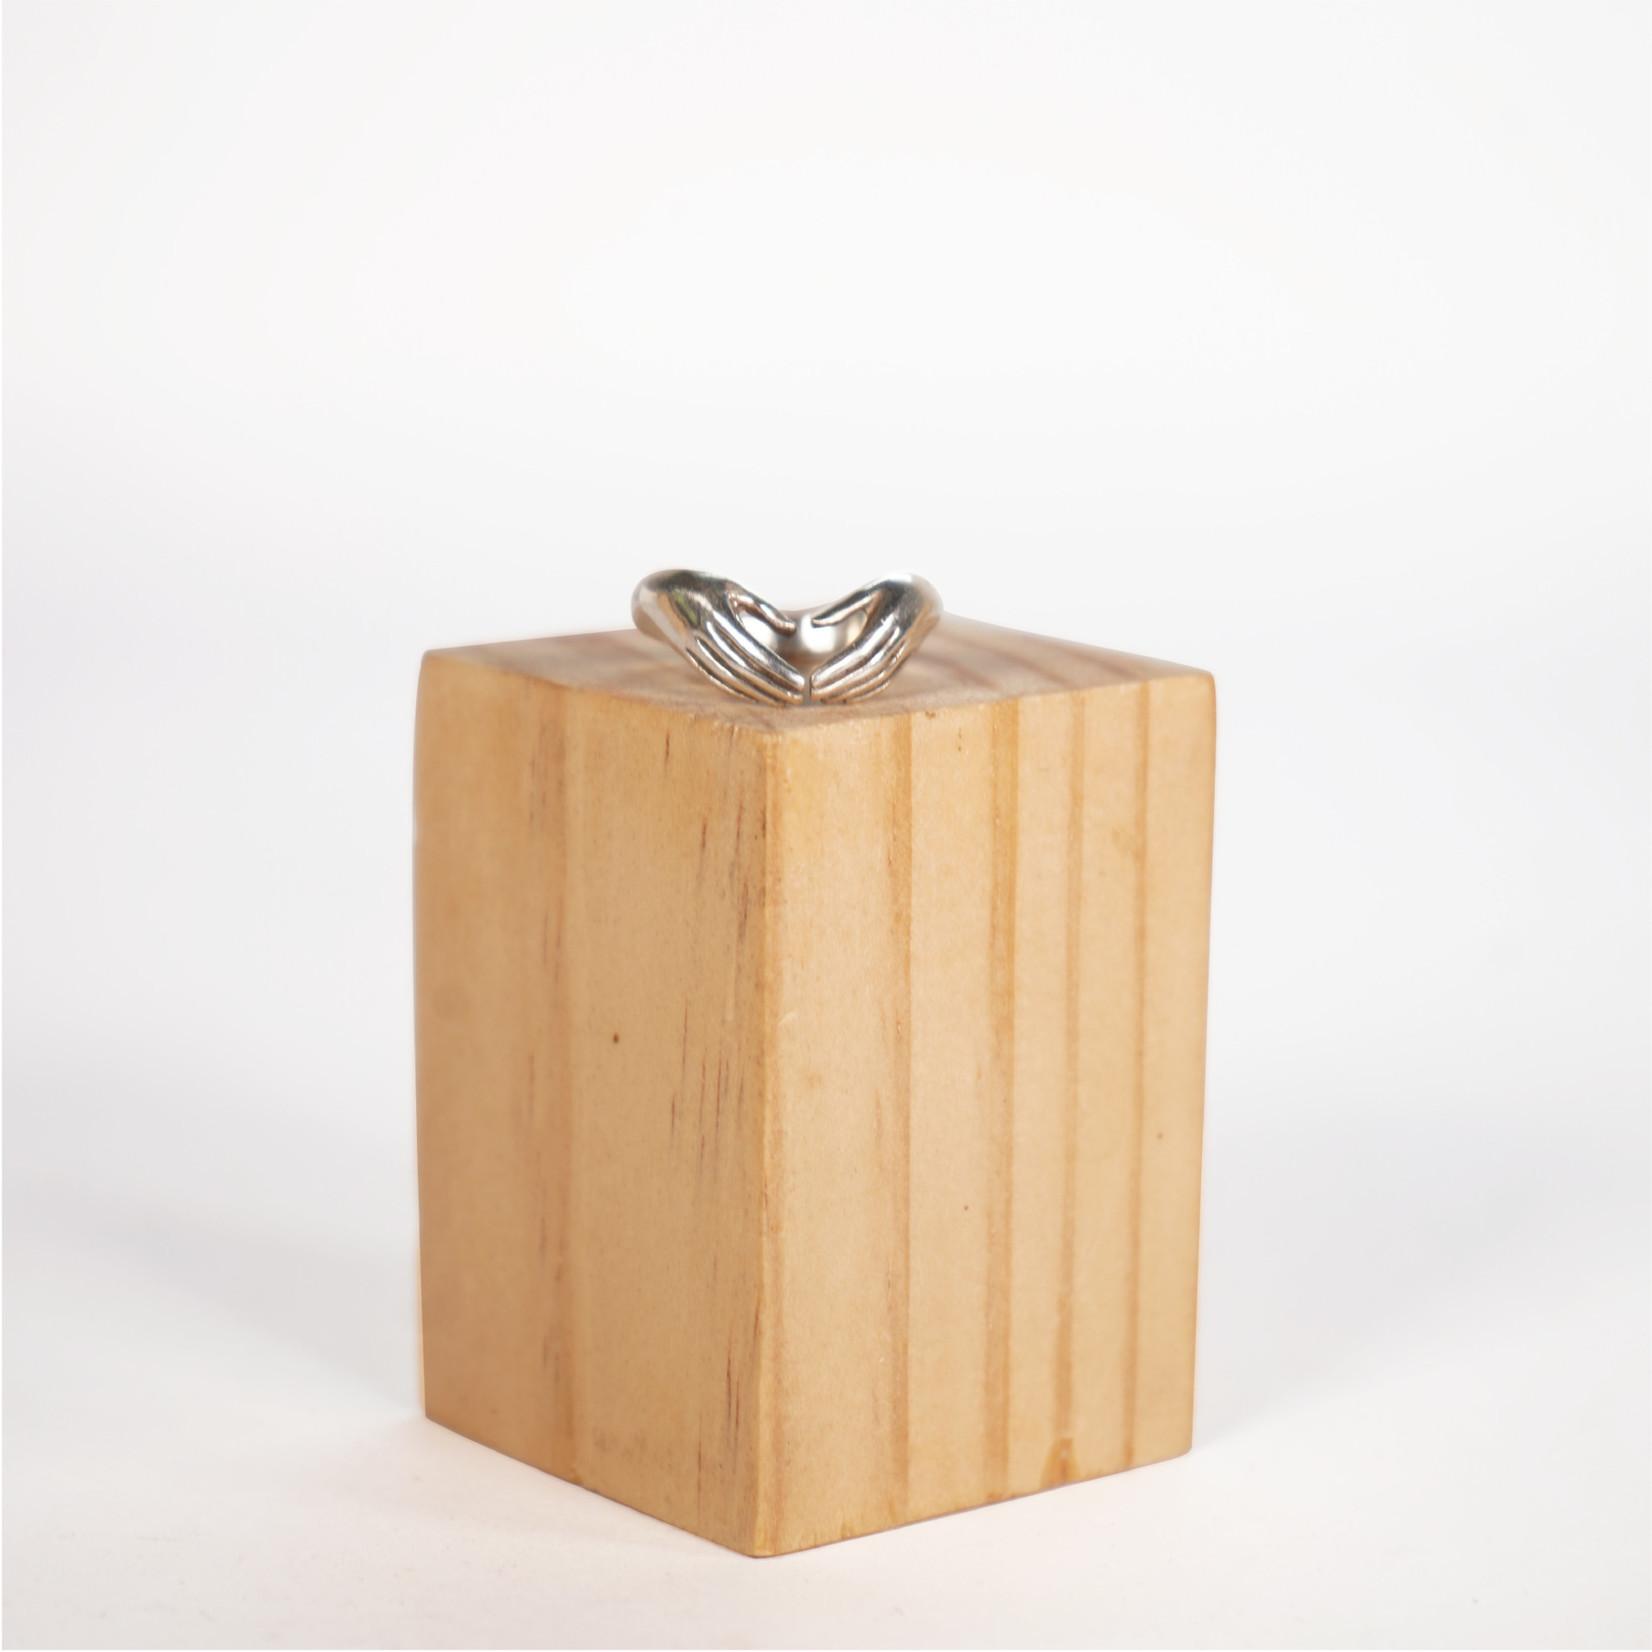 Hasta el Cogote Hands Ring